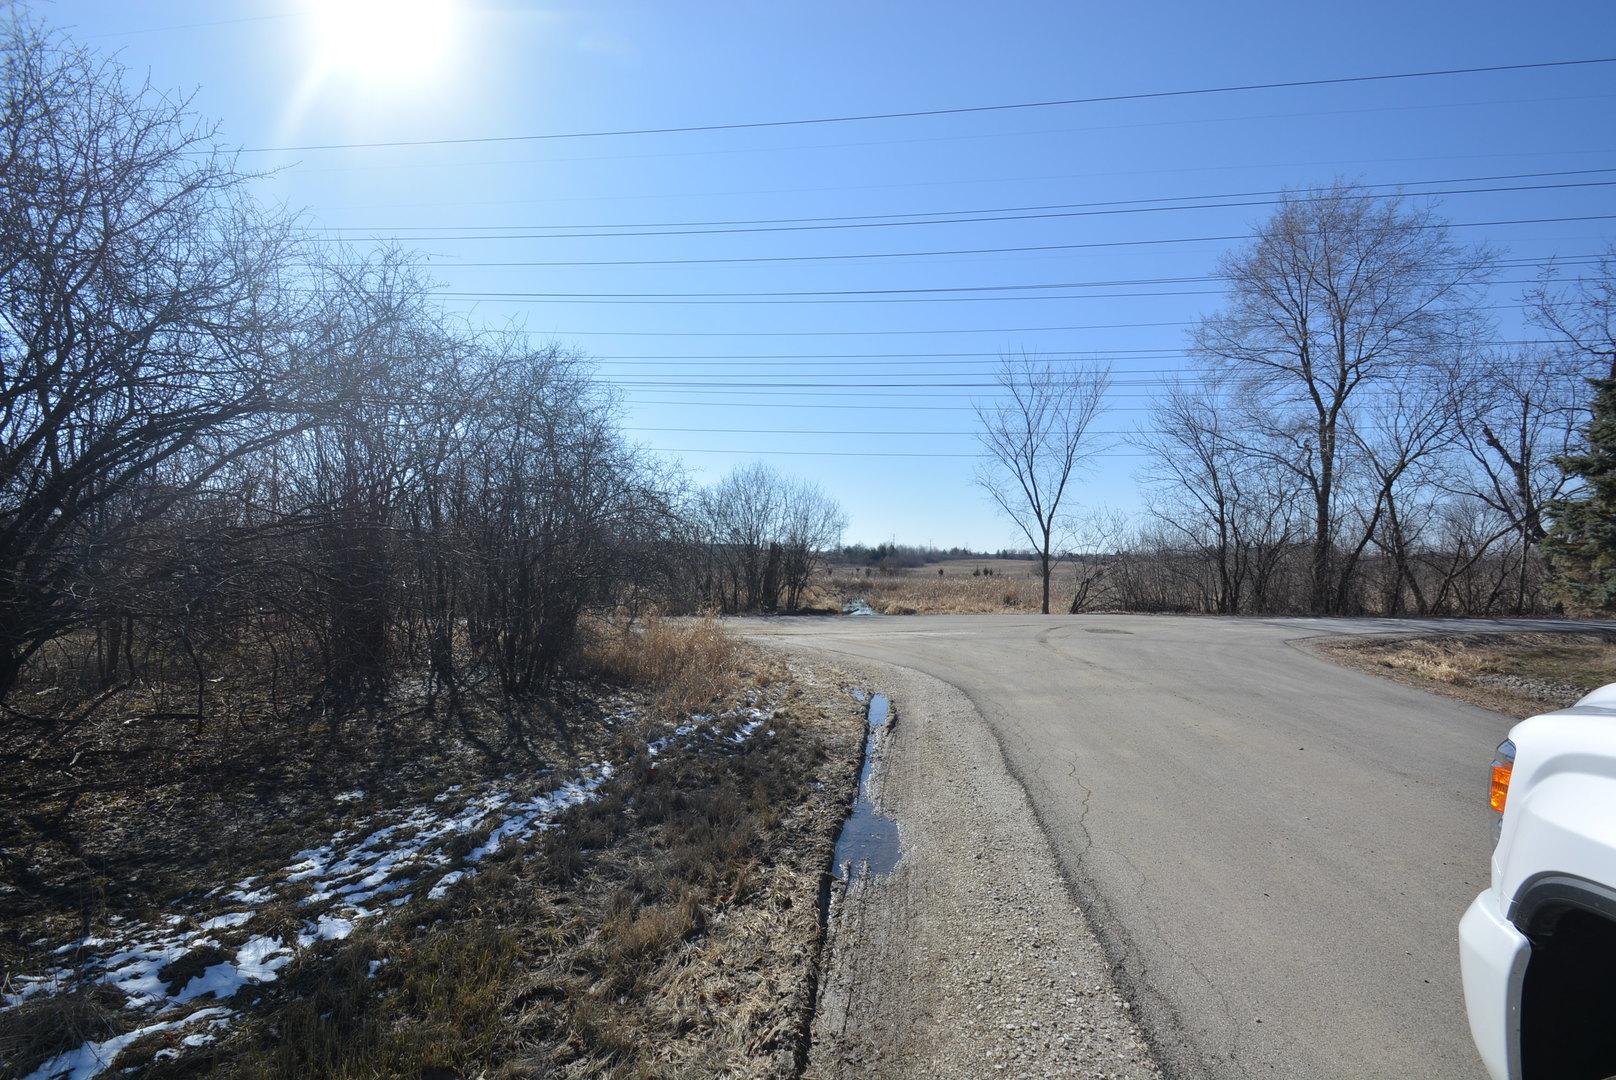 21w783 Parkside Avenue, Addison, IL - USA (photo 4)